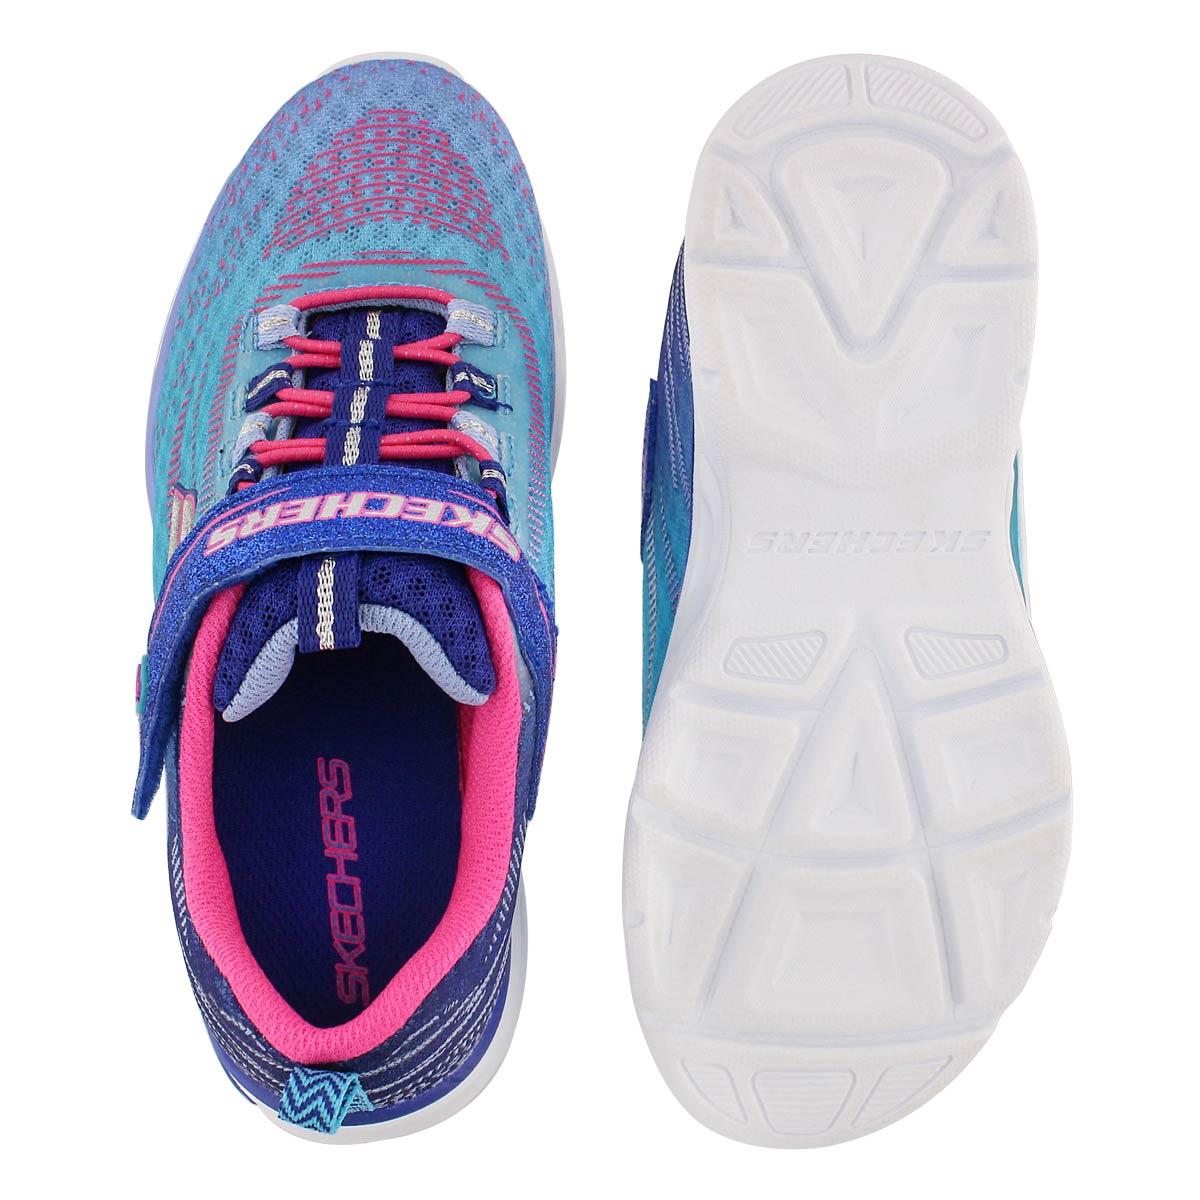 Grls Litebeams blu ombre lightup sneaker